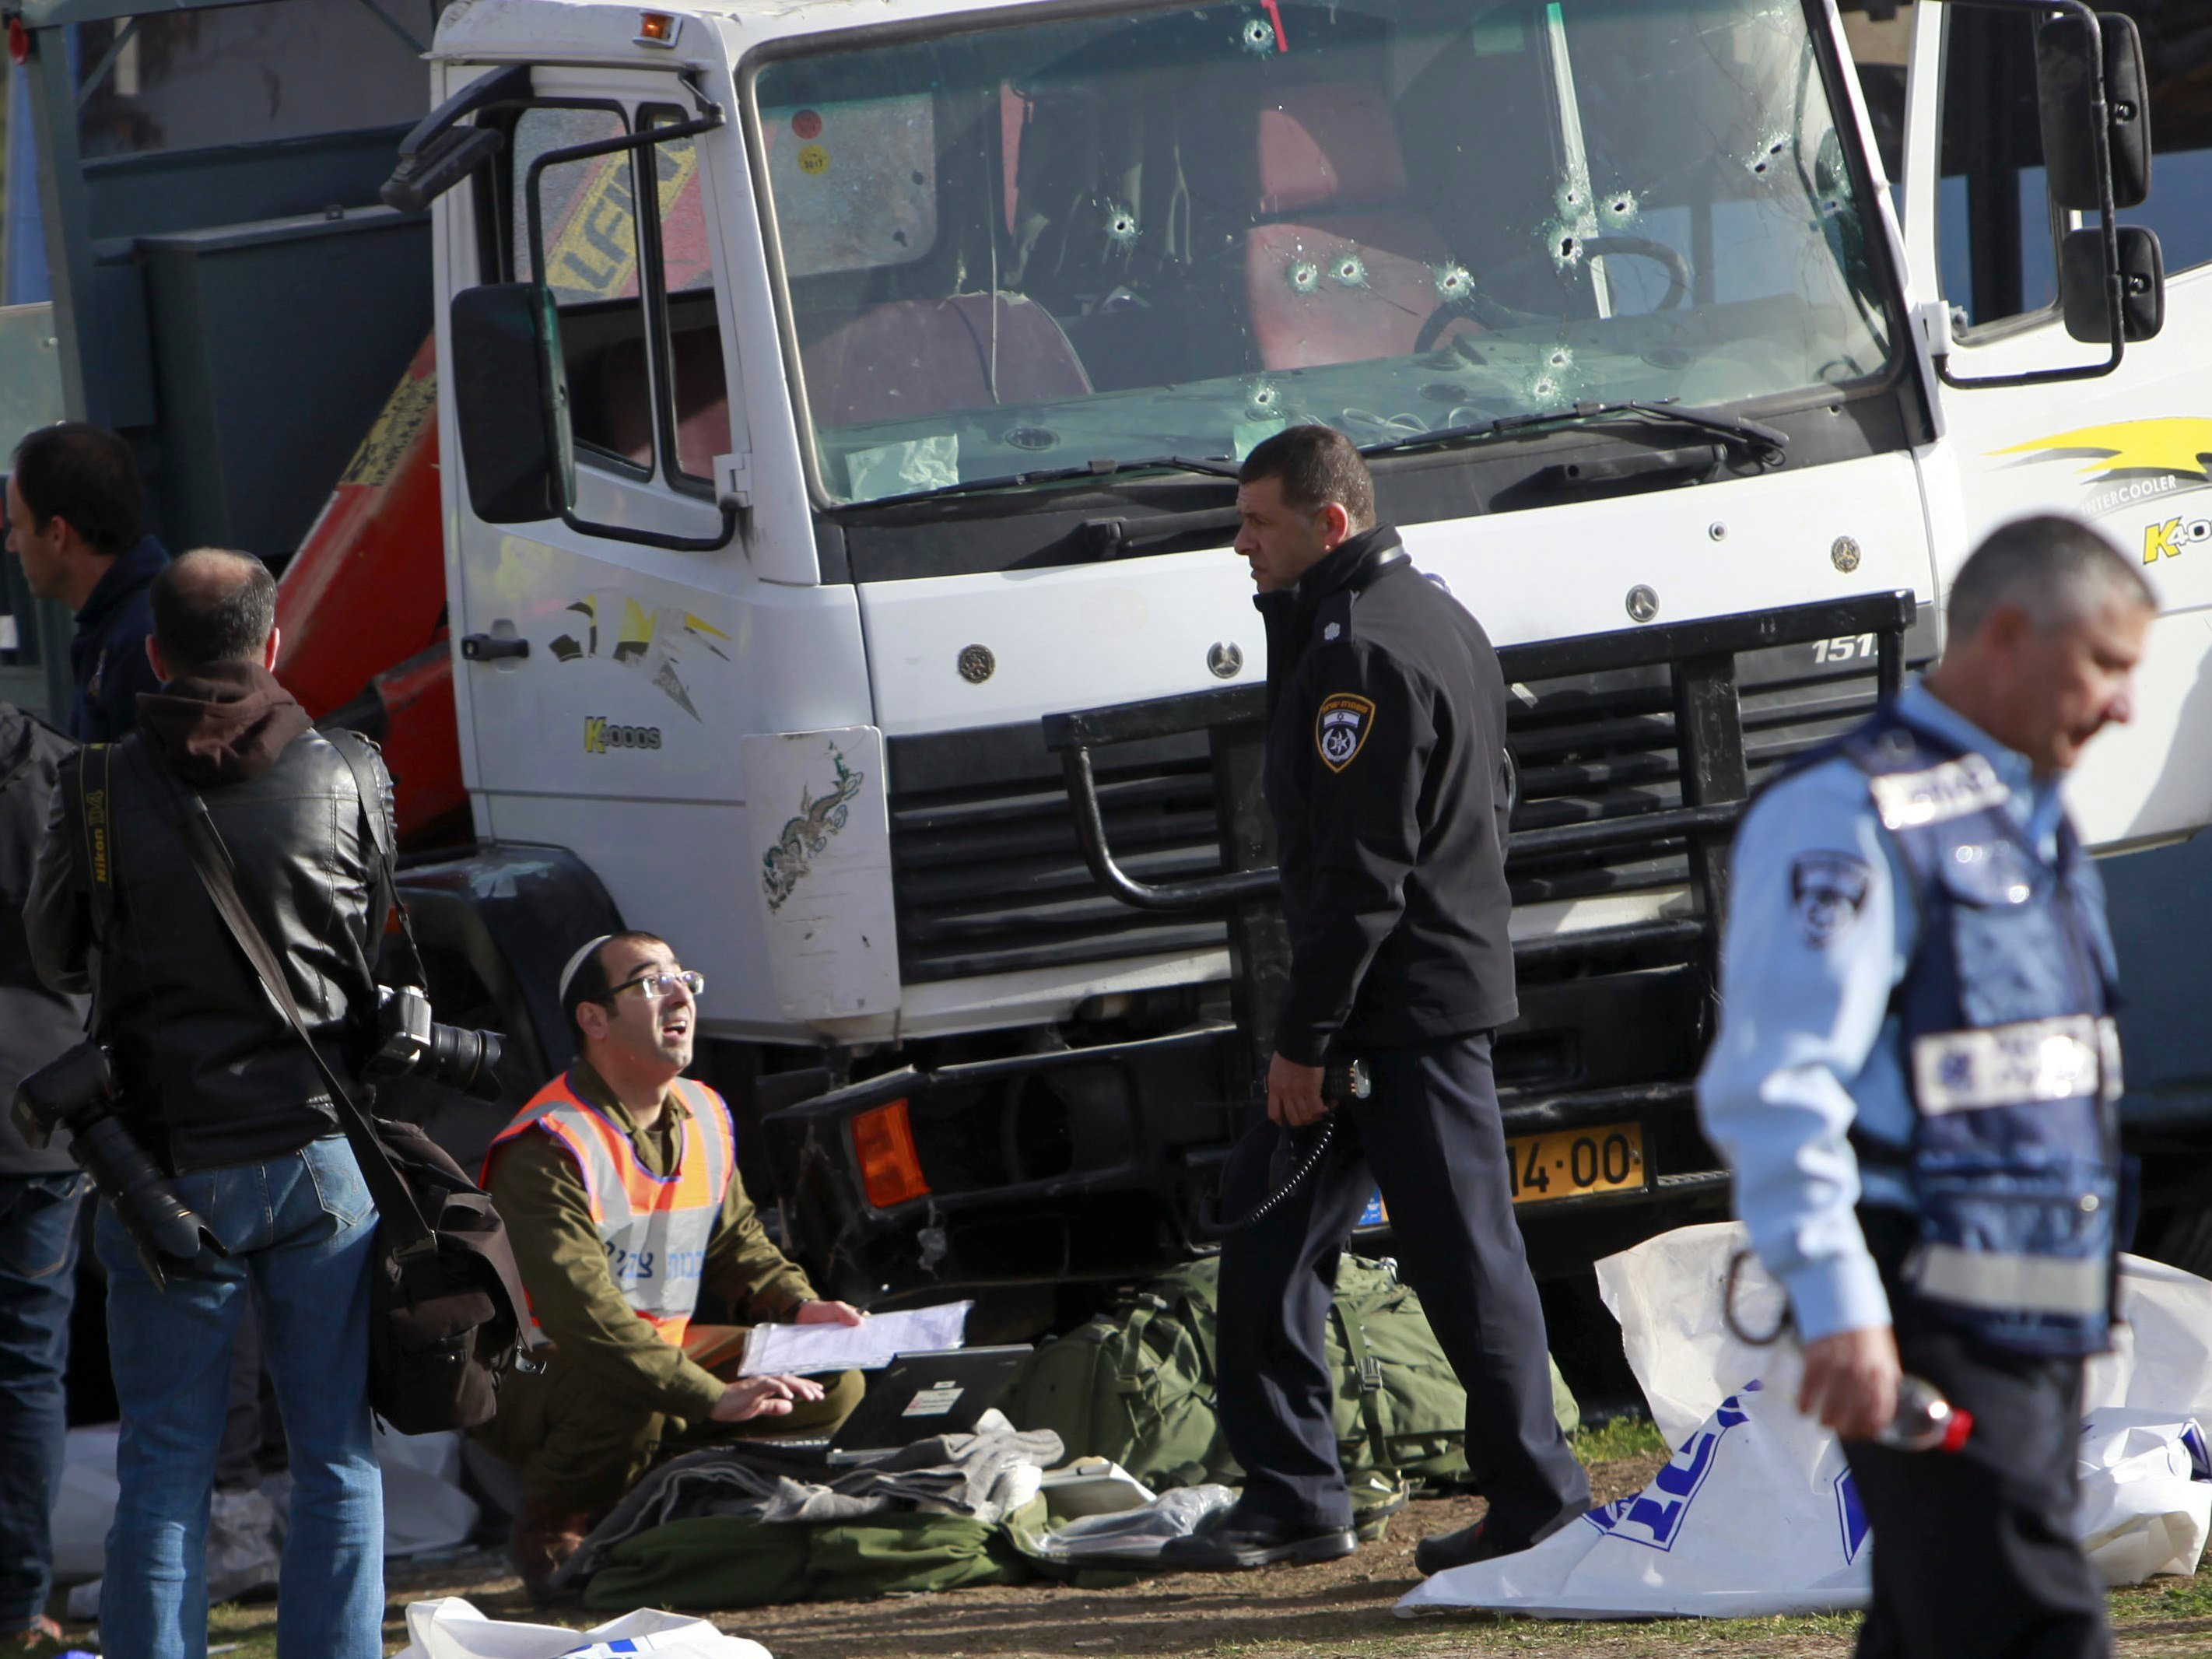 Israeli police investigates the scene of an attack in Jerusalem Sunday, Jan. 8, 2017. (AP Photo/Mahmoud Illean)